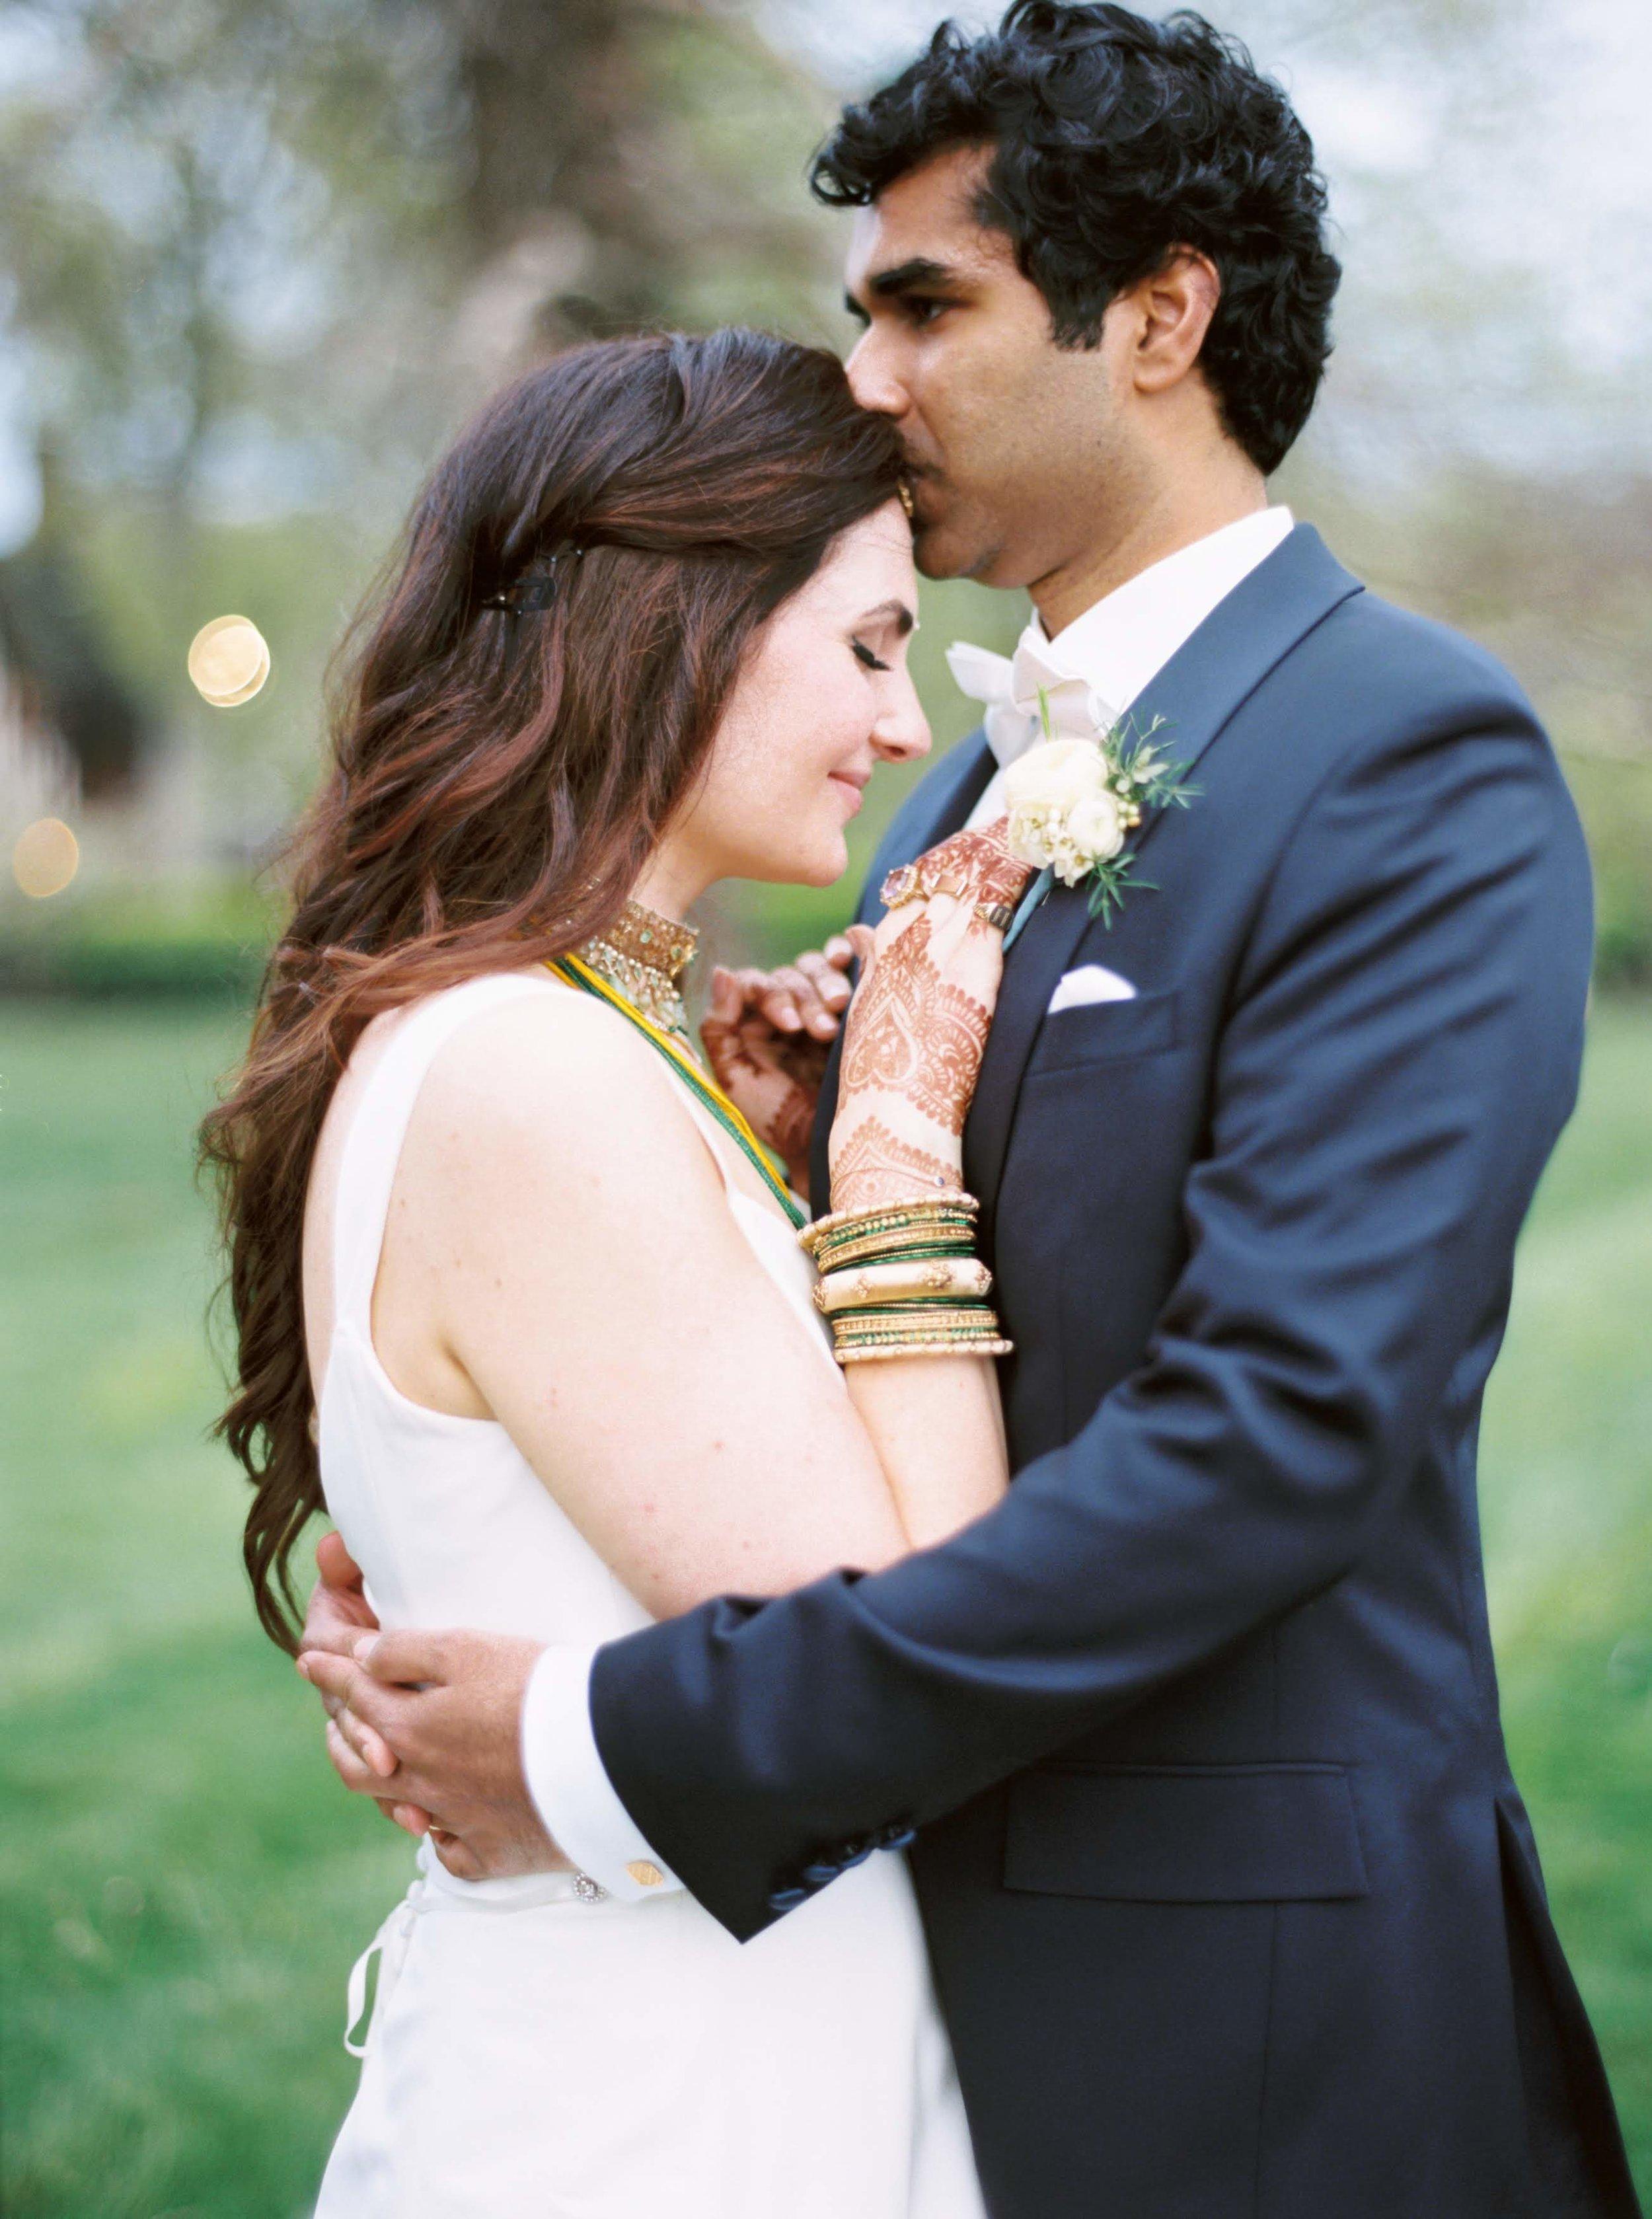 nicoleclareyphoto_hannah+akash_bride+groom-82.jpg